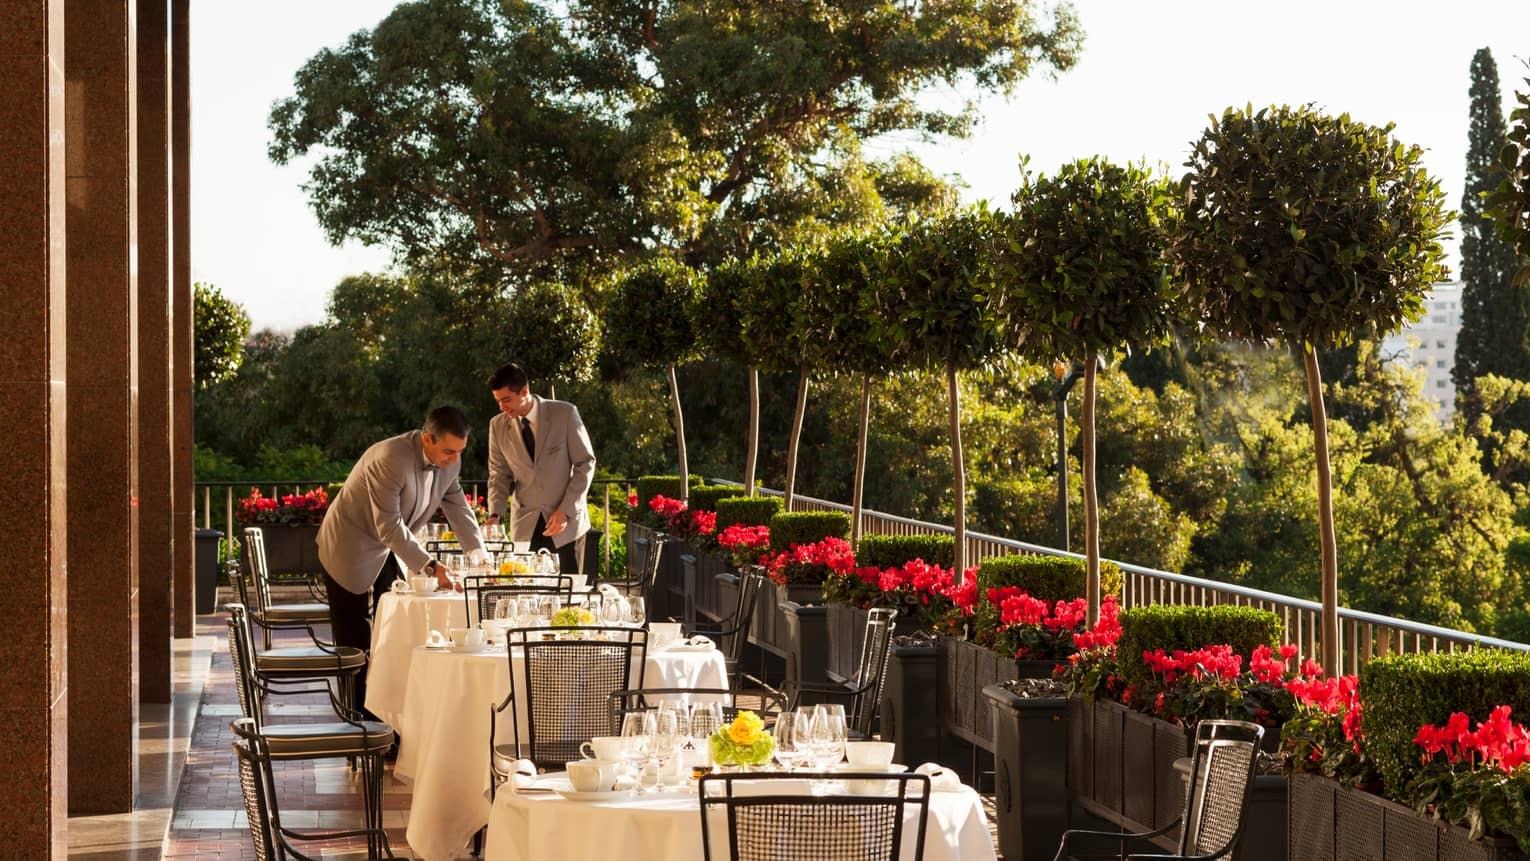 Lisbon Restaurants & Bar | Fine Dining | Four Seasons Hotel Lisbon